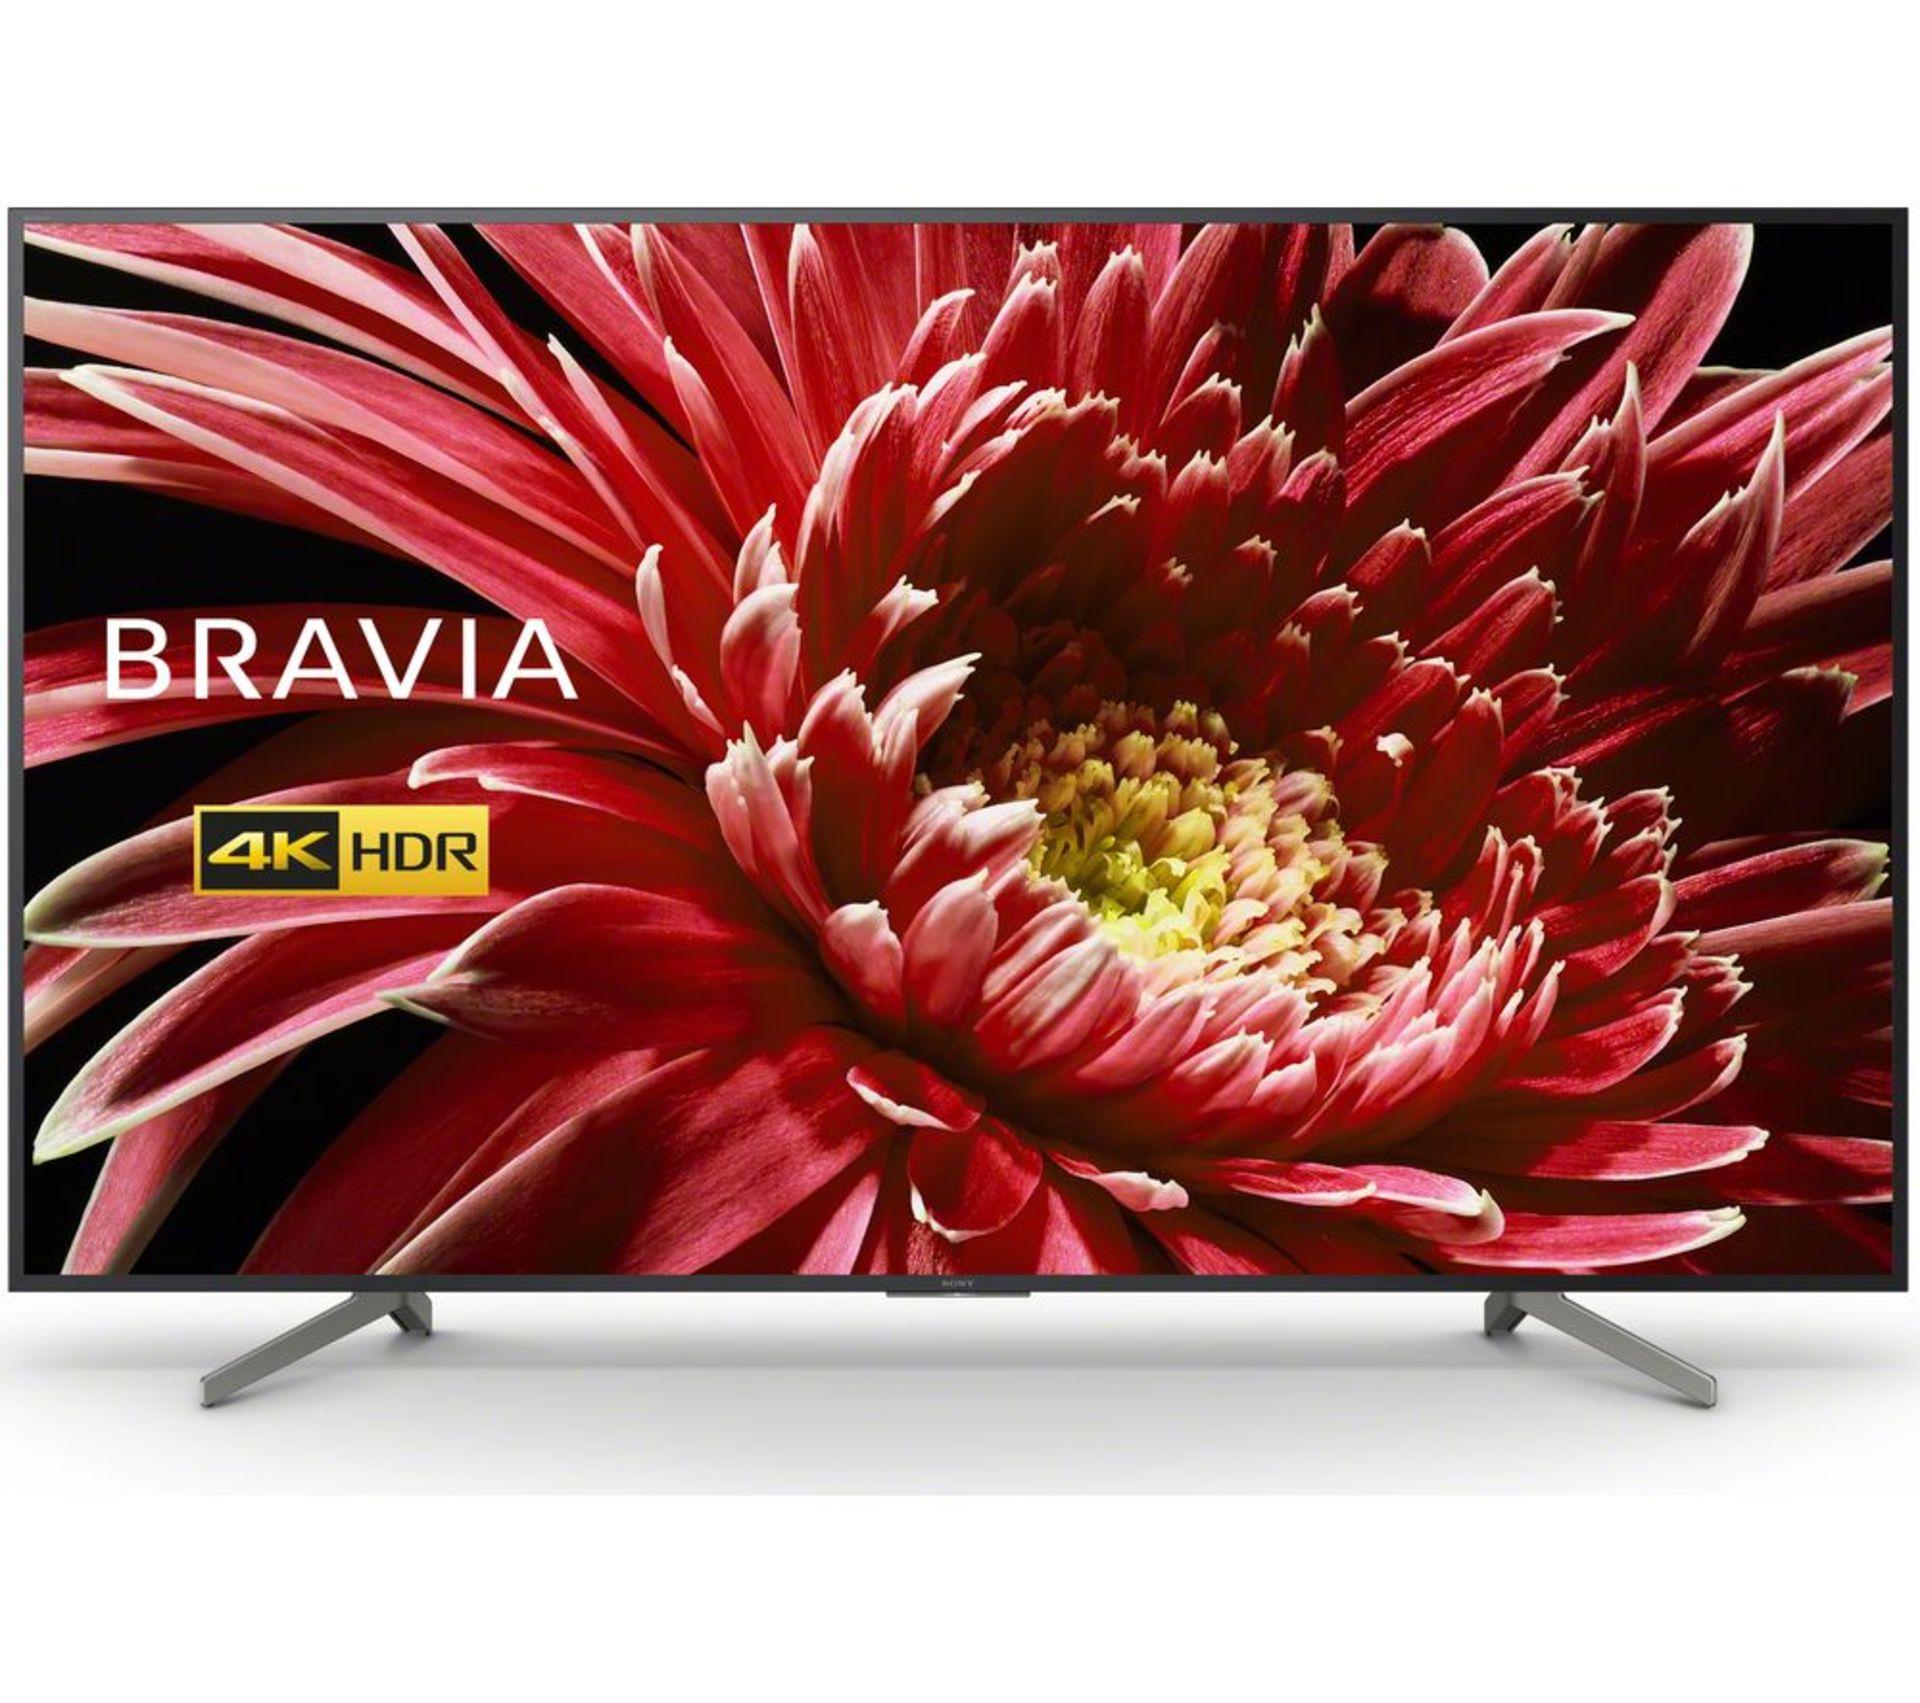 "Lot 60004 - V Brand New Sony Bravia 85"" 4K Ultra HD Smart LED TV - 4K Ultra HD 3840 x 2160p - Triluminos Display"